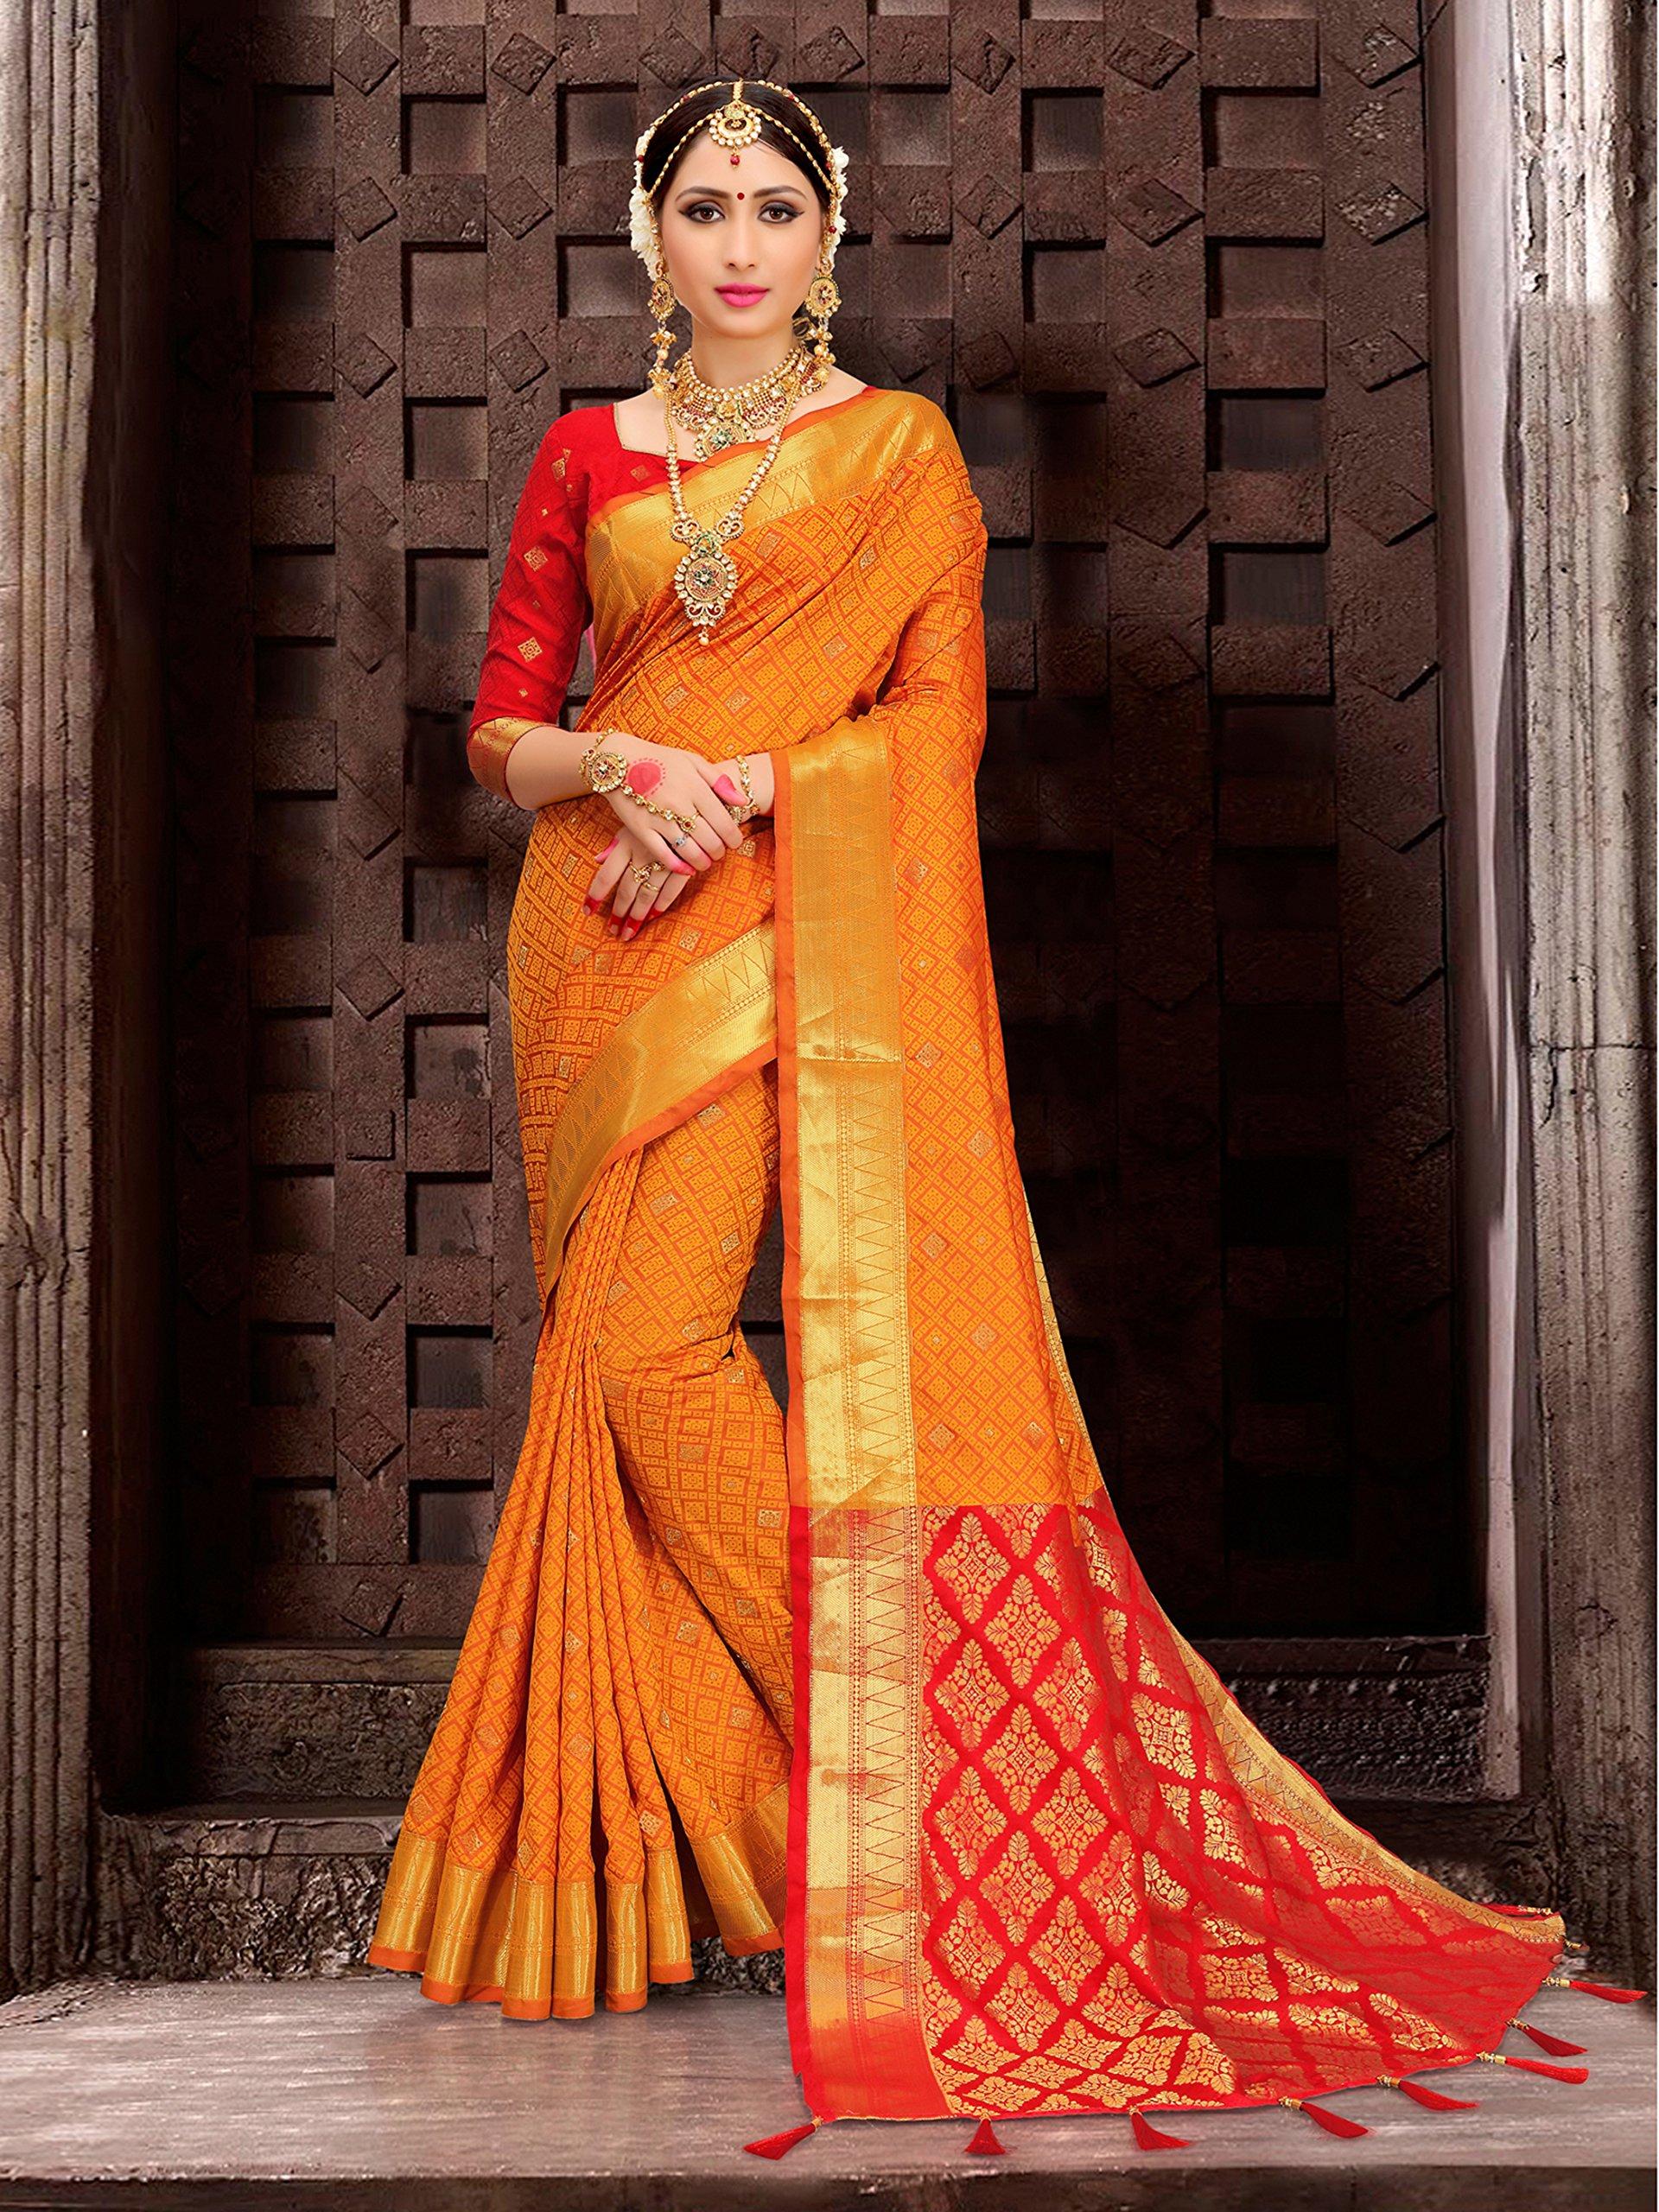 ELINA FASHION Sarees for Women Patola Art Silk Woven Work Saree l Indian Traditional Wedding Ethnic Sari with Blouse Piece (Yellow) by ELINA FASHION (Image #2)